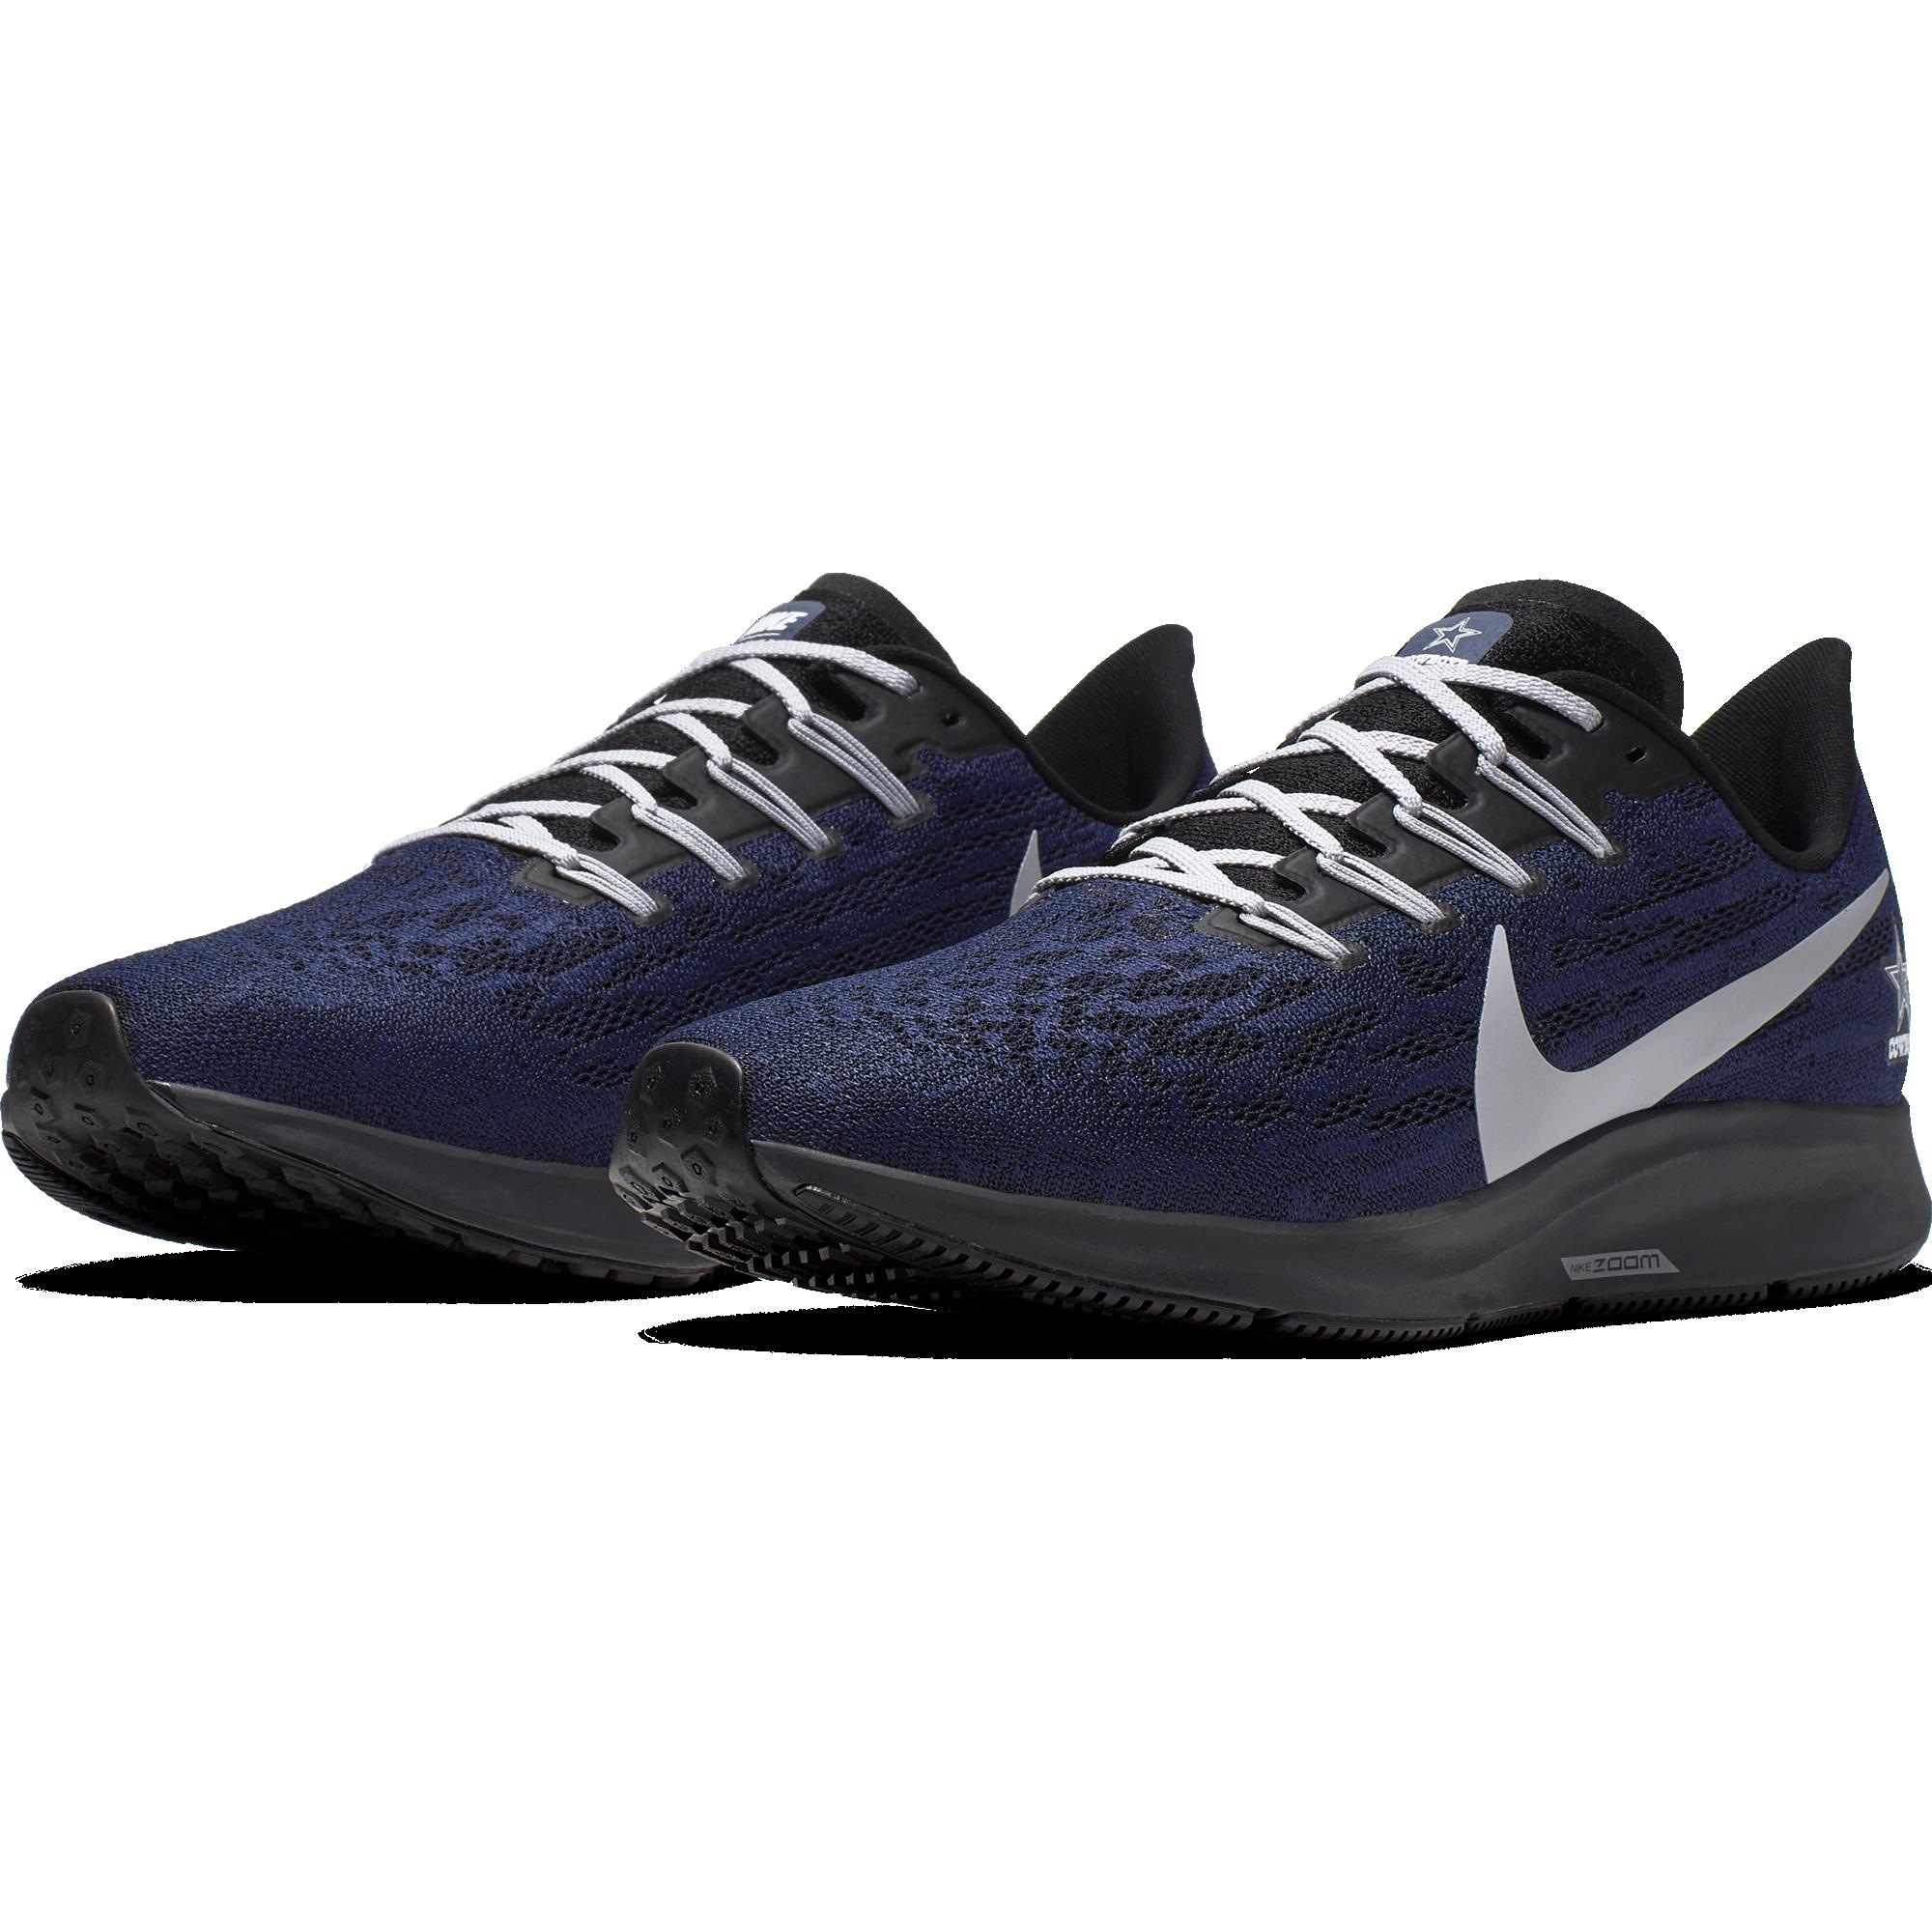 faf90698 Nike drops the new Air Zoom Pegasus 36 Dallas Cowboys shoe ...